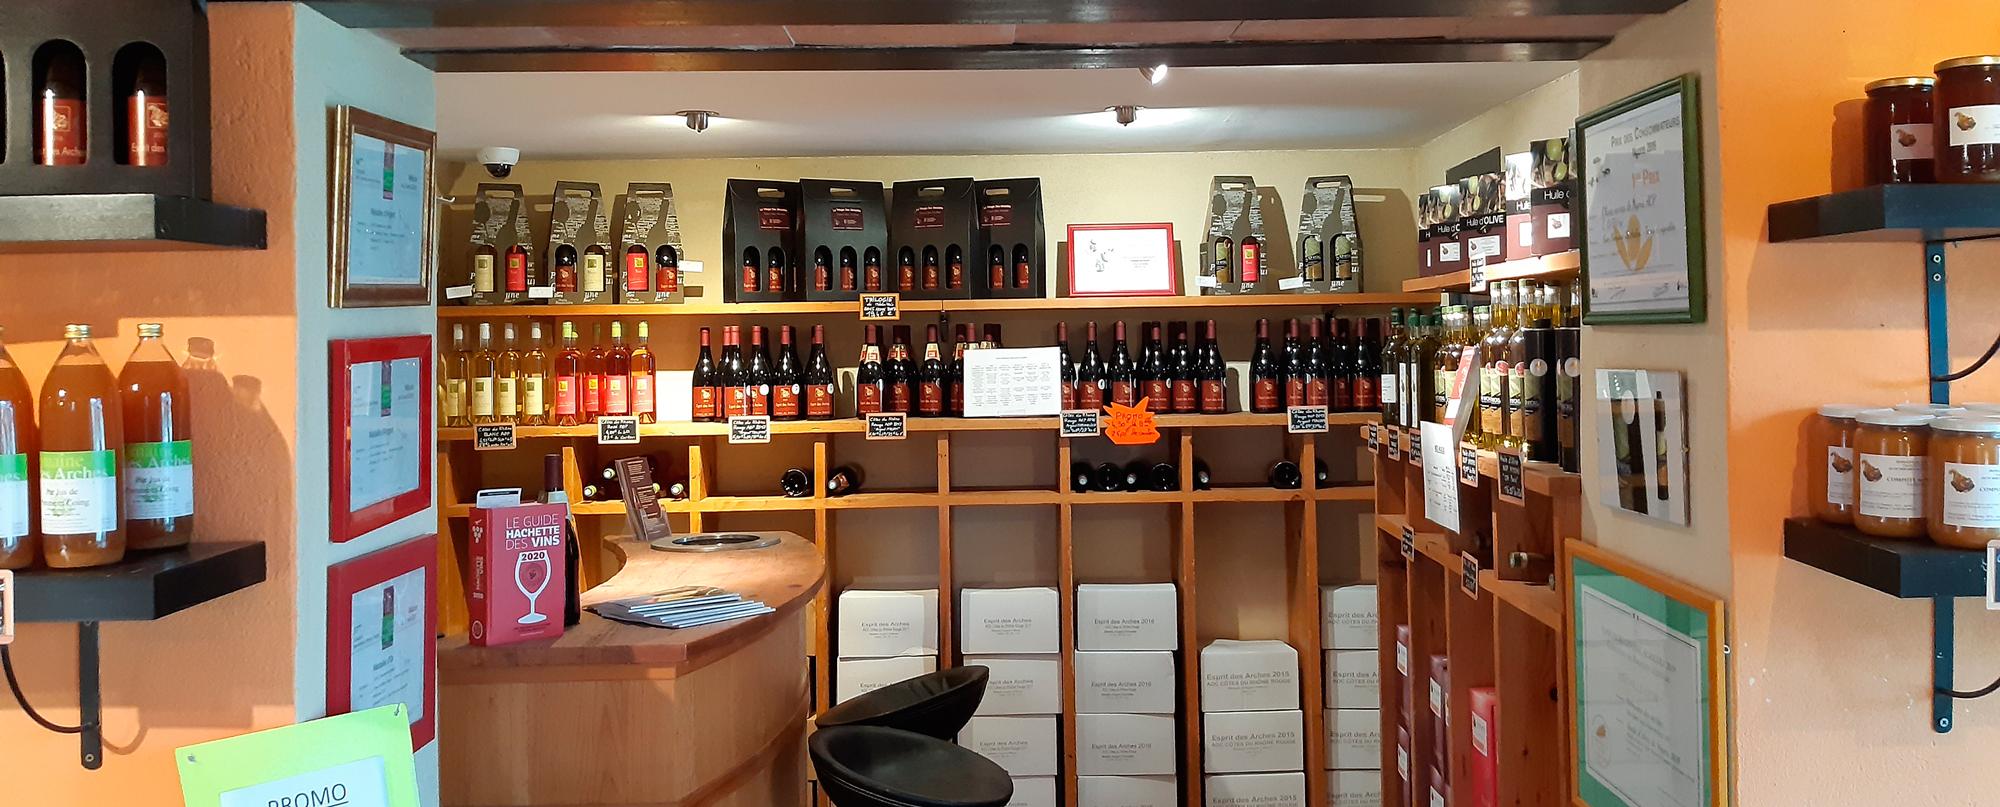 huile d'olive AOP - vin Côtes du Rhône